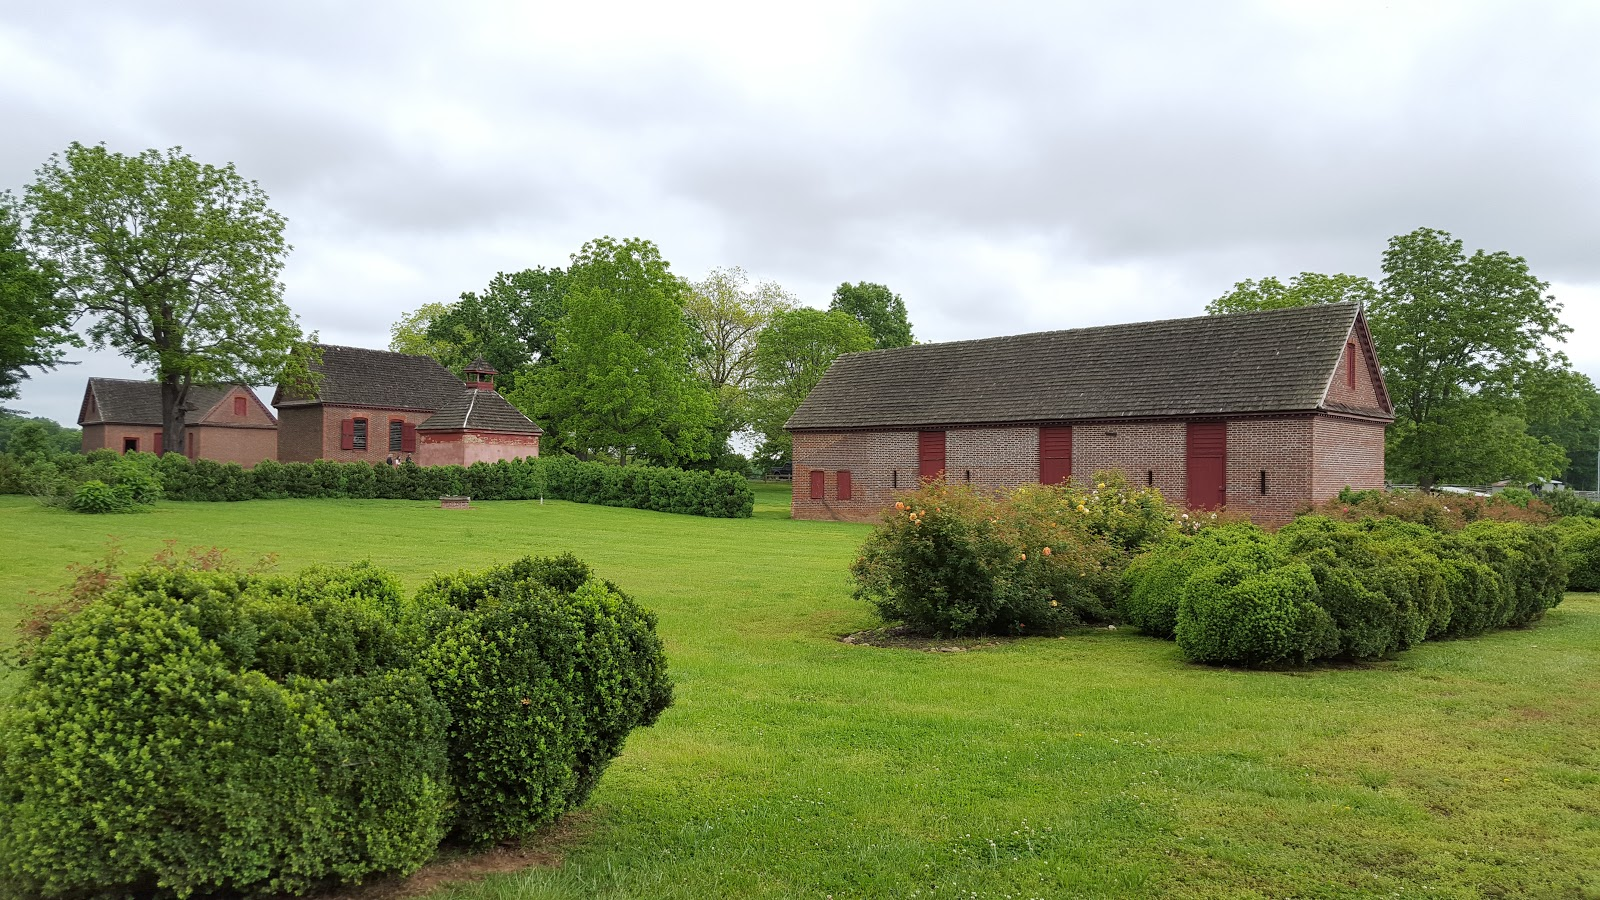 My Patchwork Quilt: SHIRLEY PLANTATION - CHARLES CITY, VA